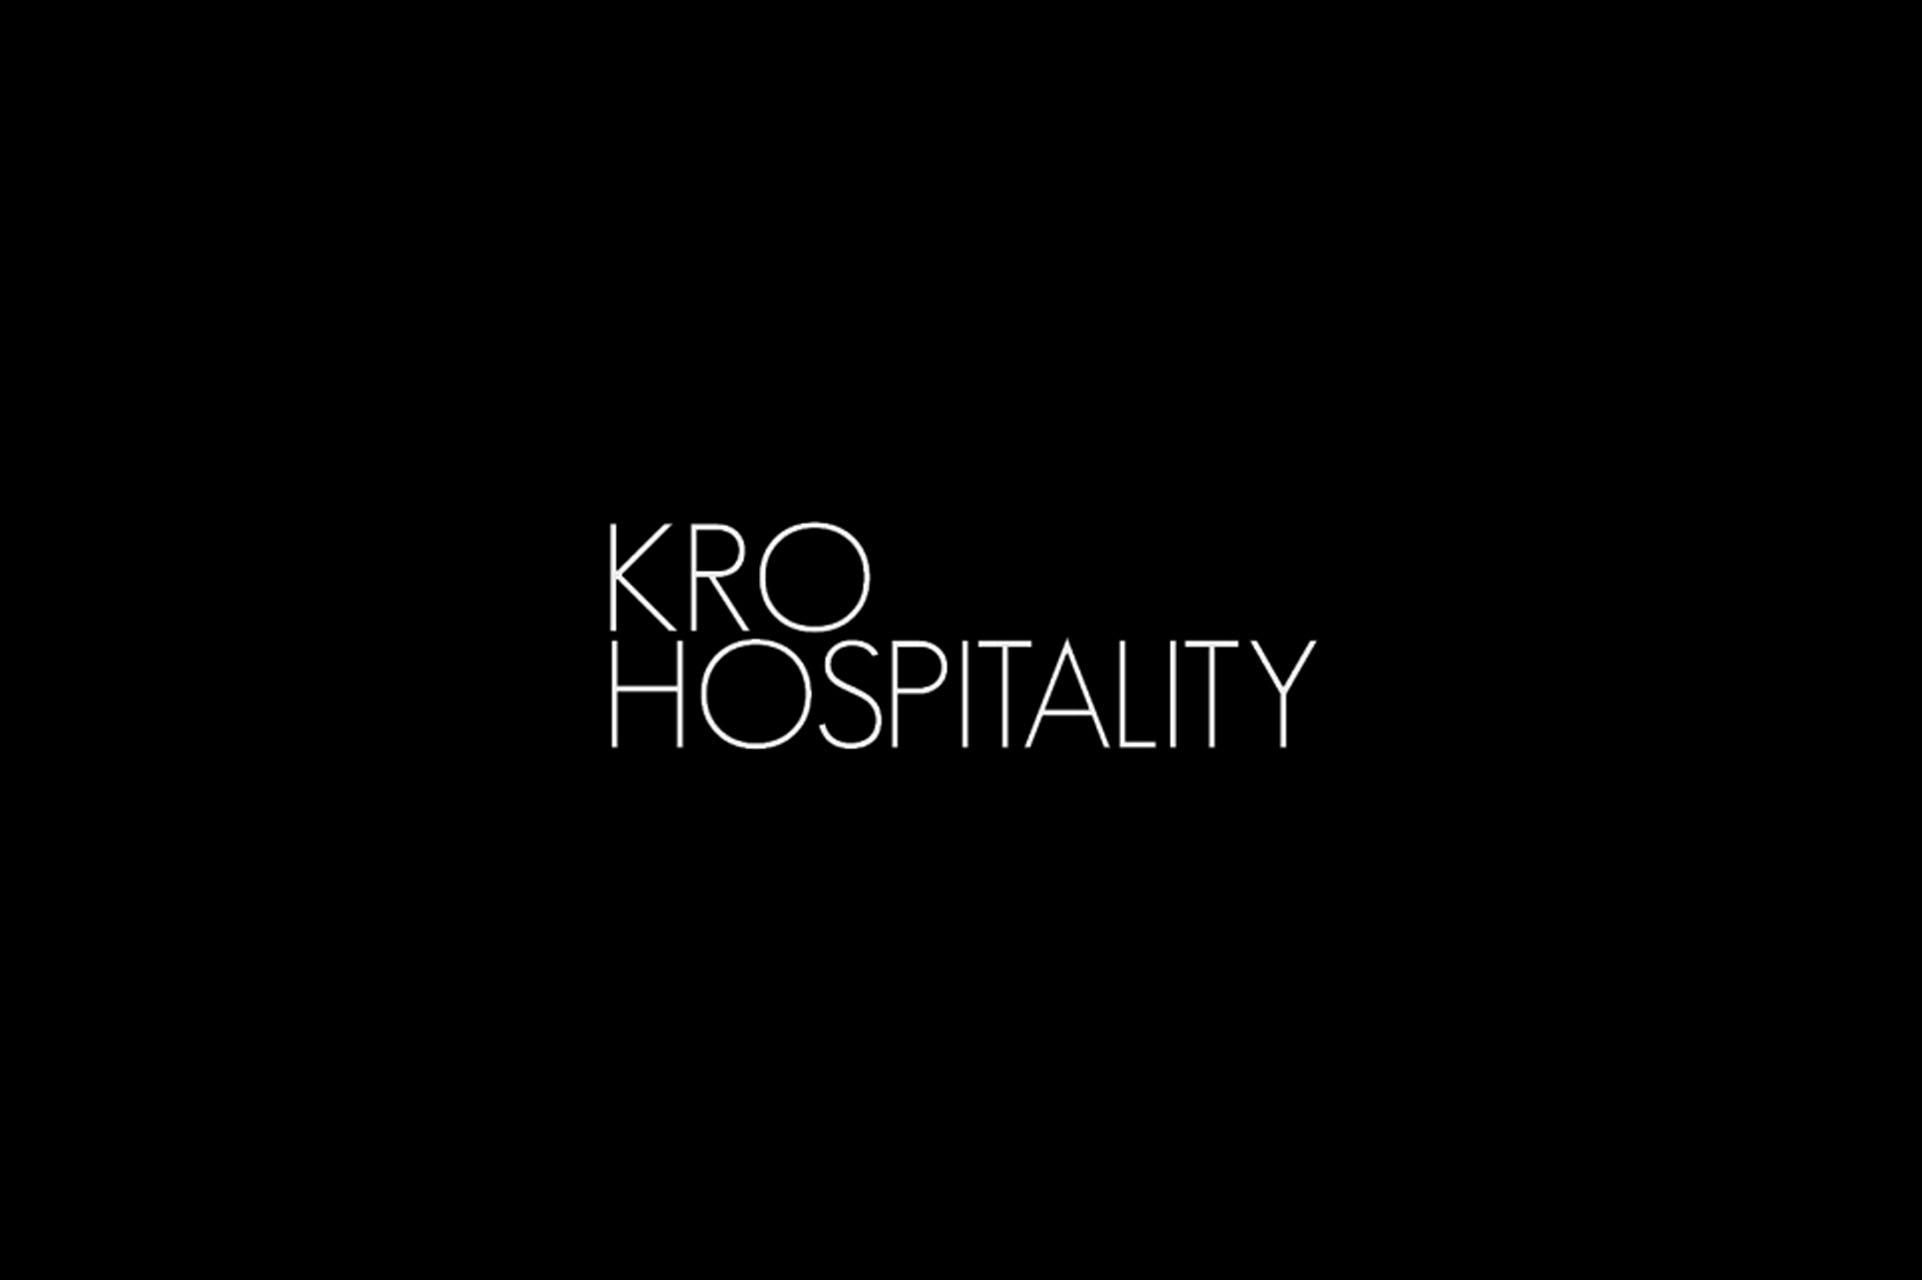 KRO Hospitality